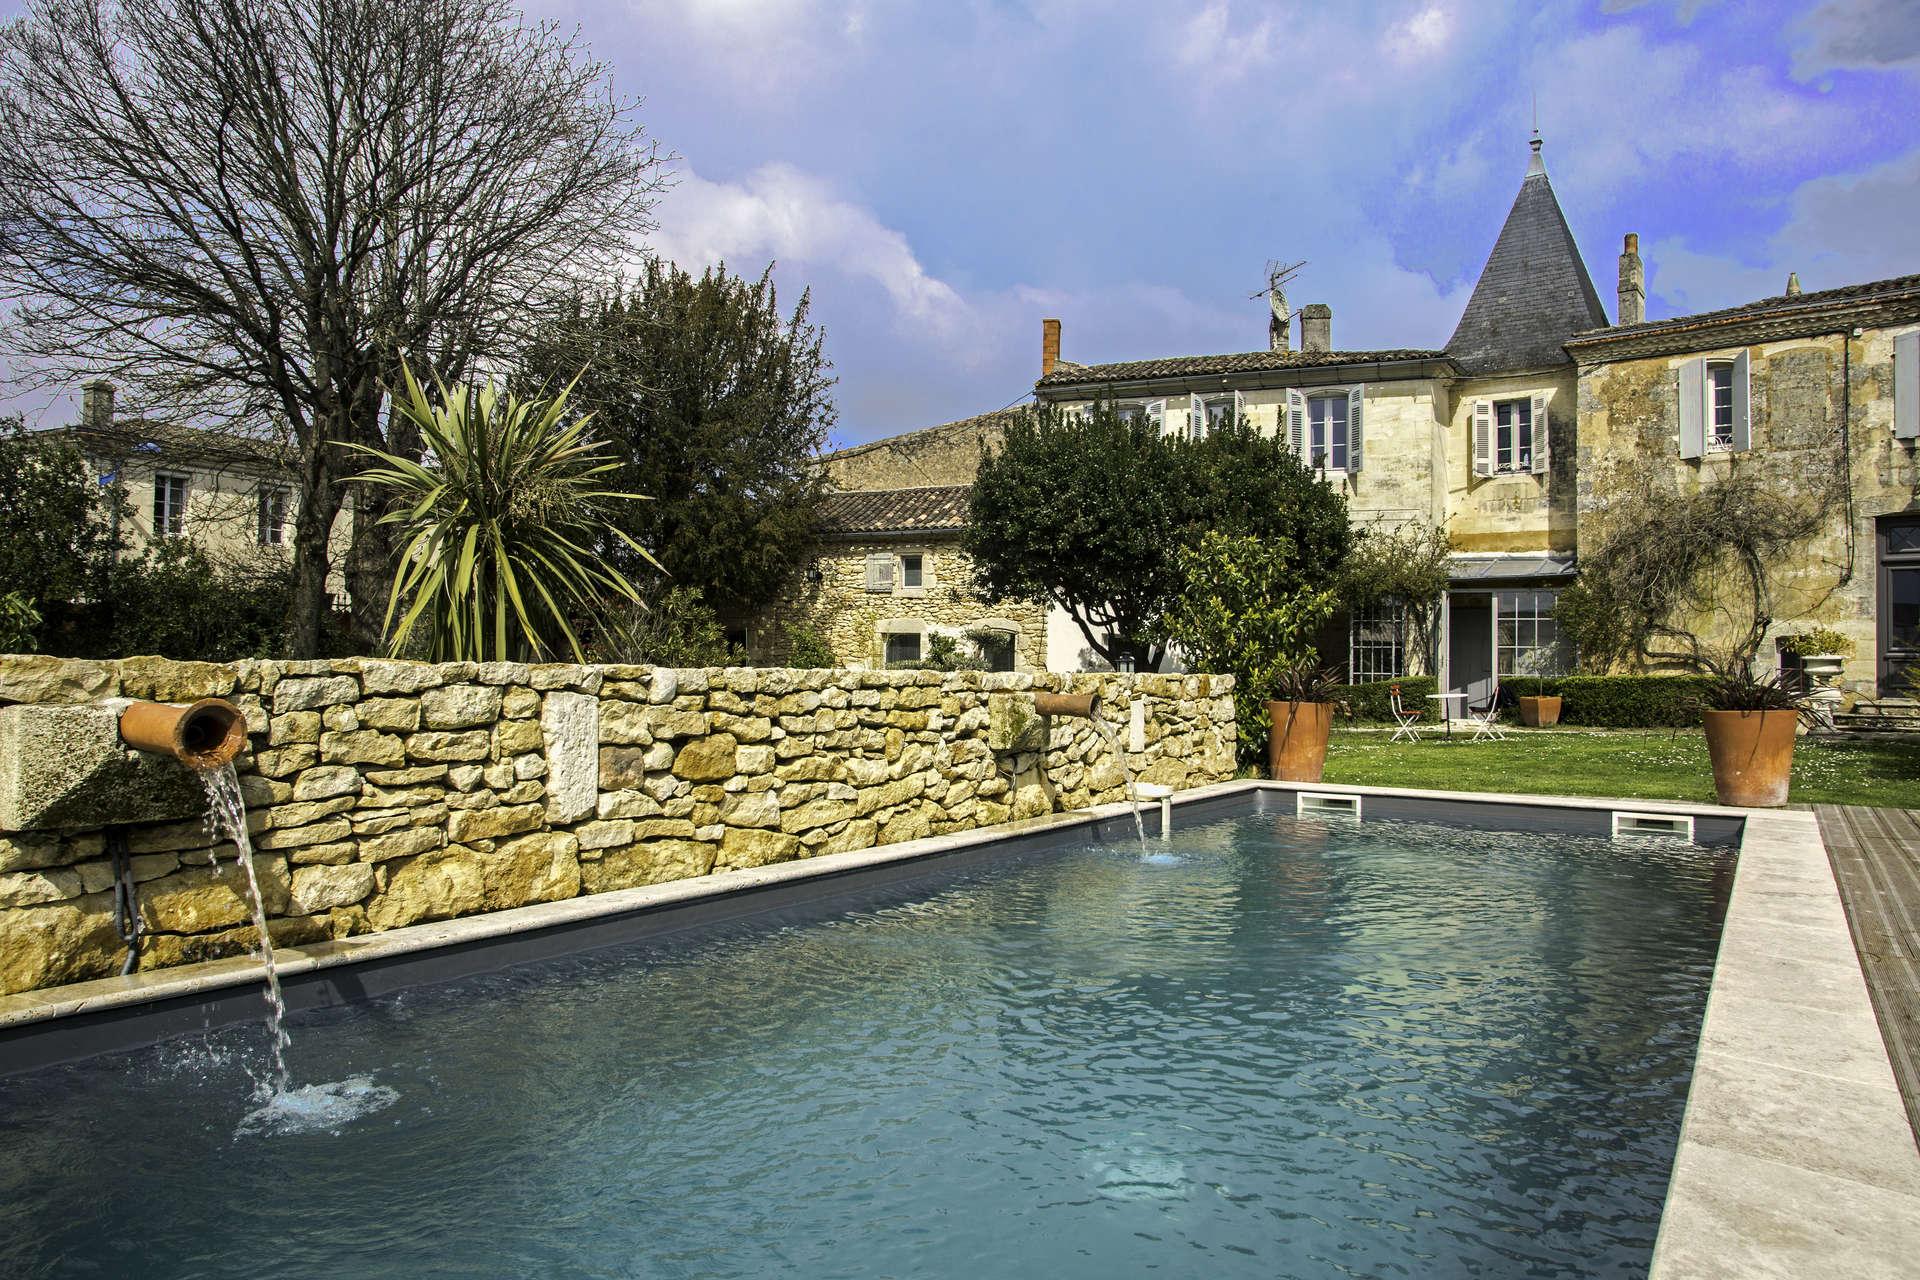 Luxury vacation rentals europe - France - Southwest france - Bord eaux - Cote de Blaye - Image 1/18